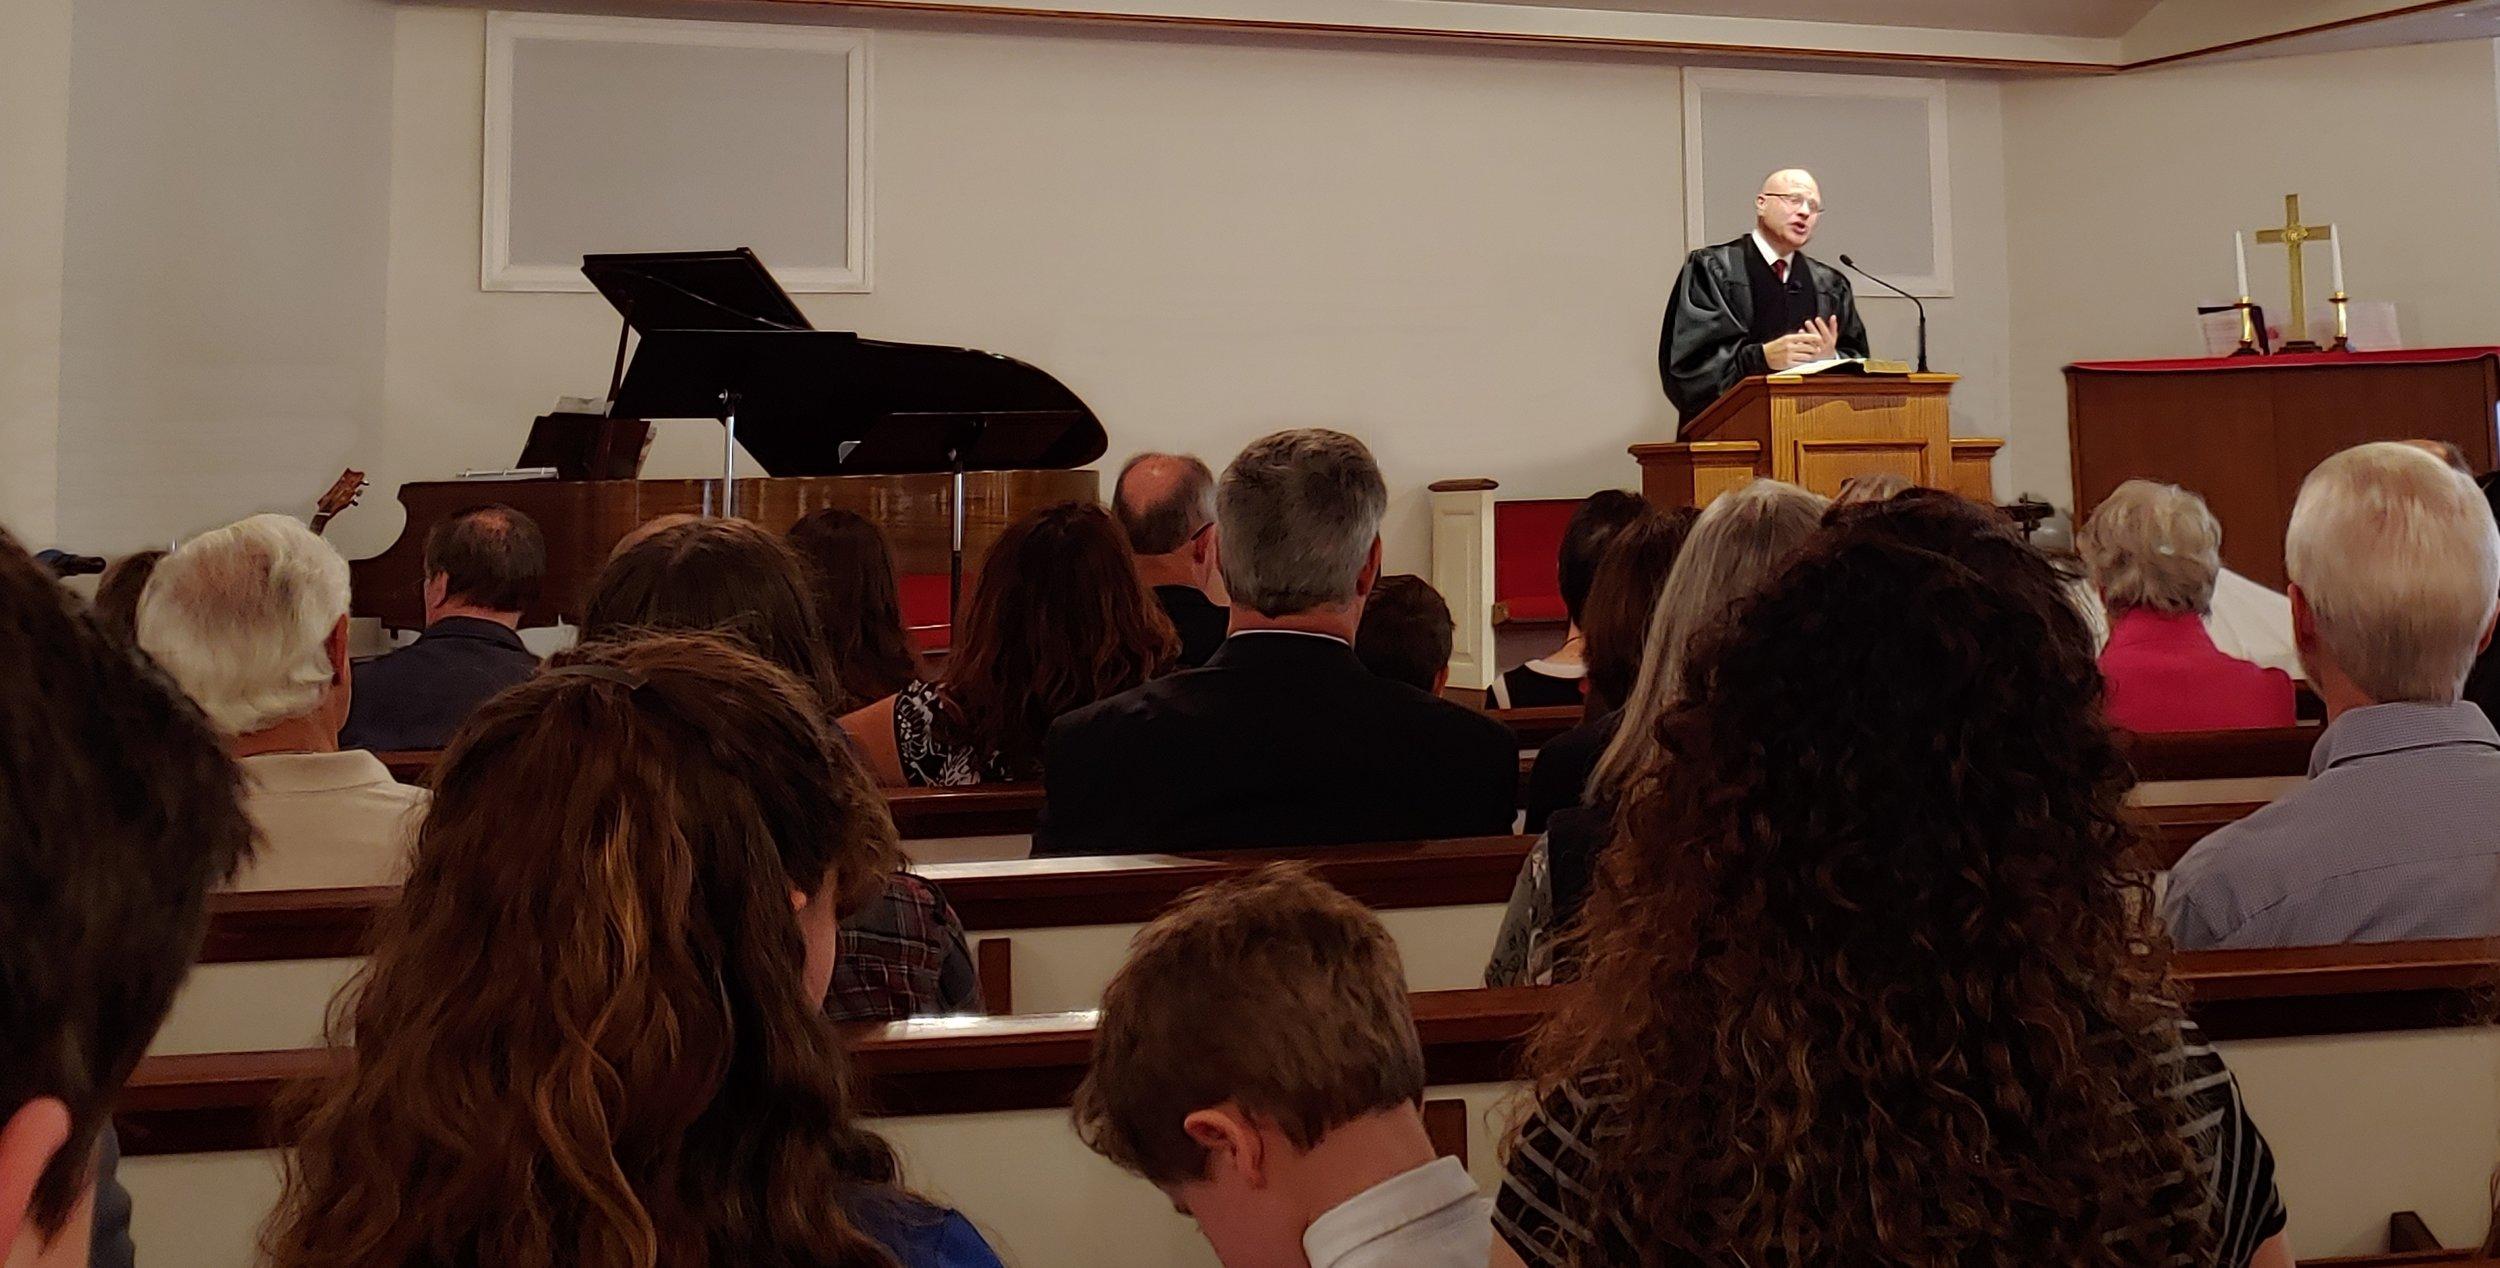 2018-11-04, Dedication Service, Preaching 2, Scott Shaw.jpg